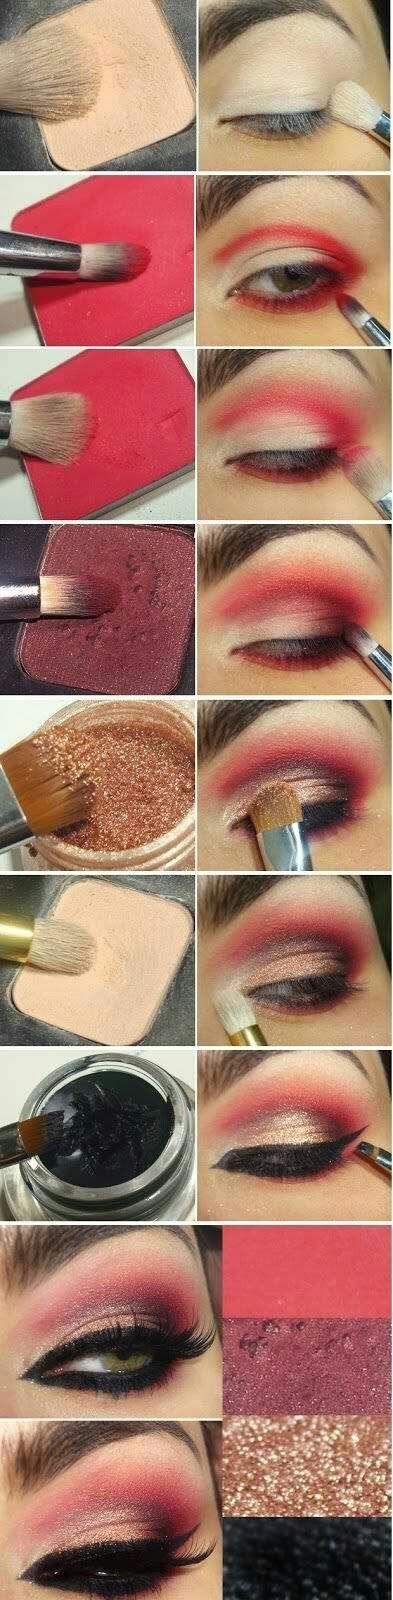 Pin By Jessica Jacobo On Make Up Colorful Eyeshadow Eye